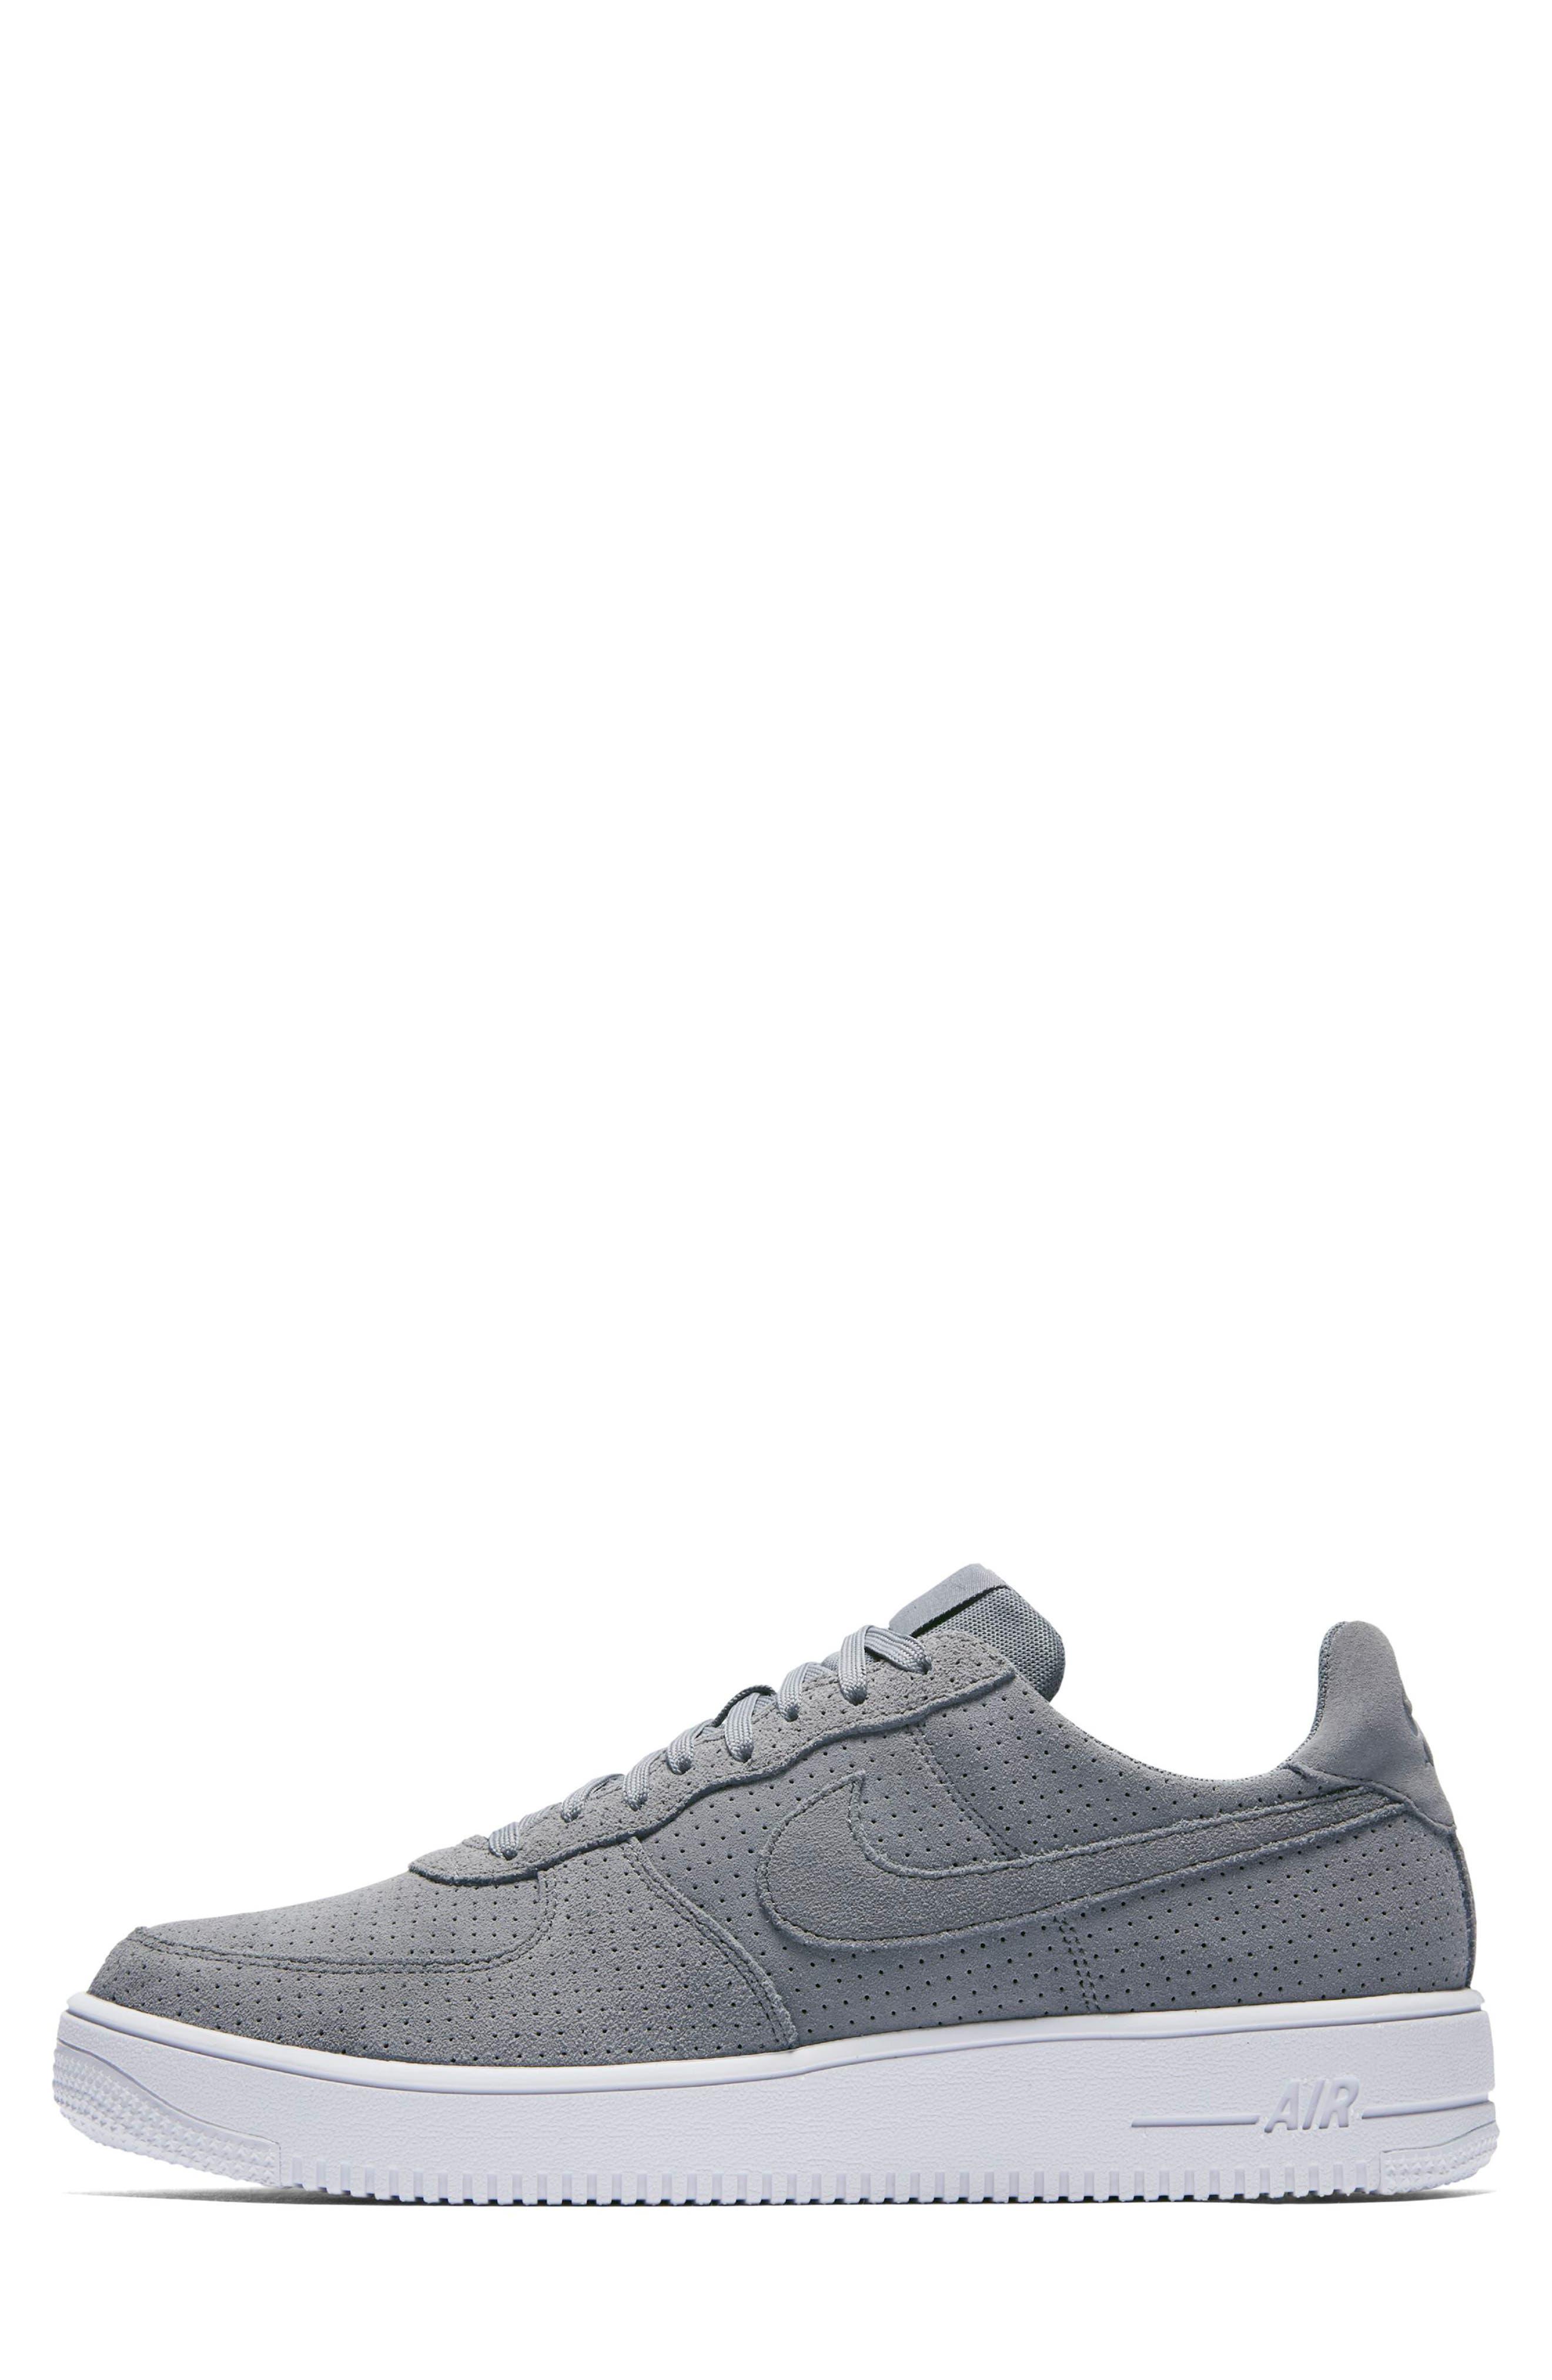 Air Force 1 Ultraforce Sneaker,                             Alternate thumbnail 5, color,                             029